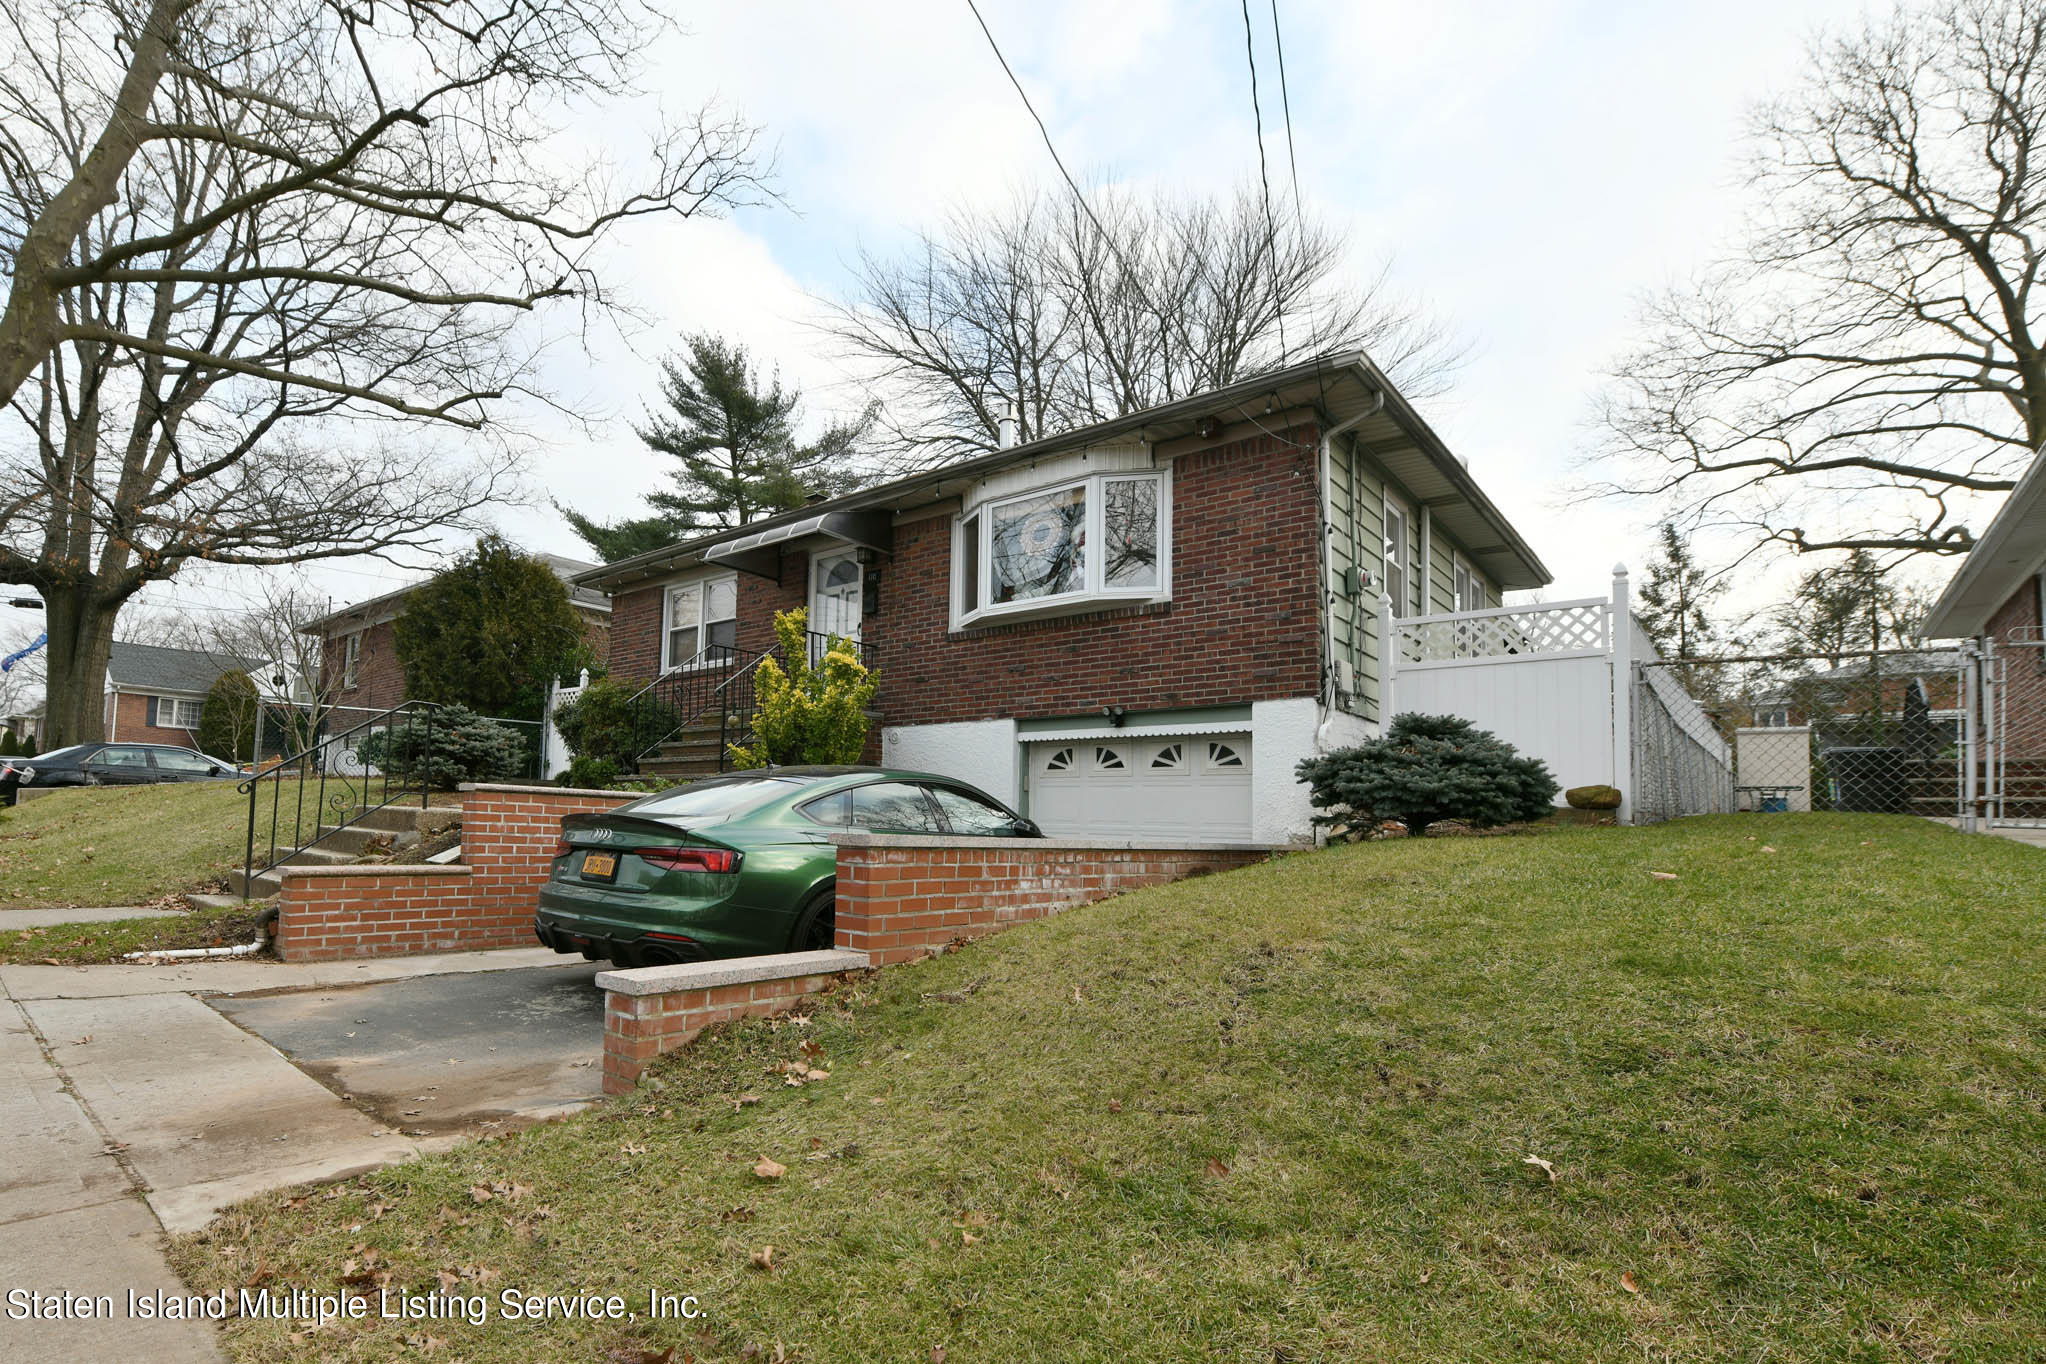 Single Family - Detached 110 Ravenhurst Avenue  Staten Island, NY 10310, MLS-1143189-14